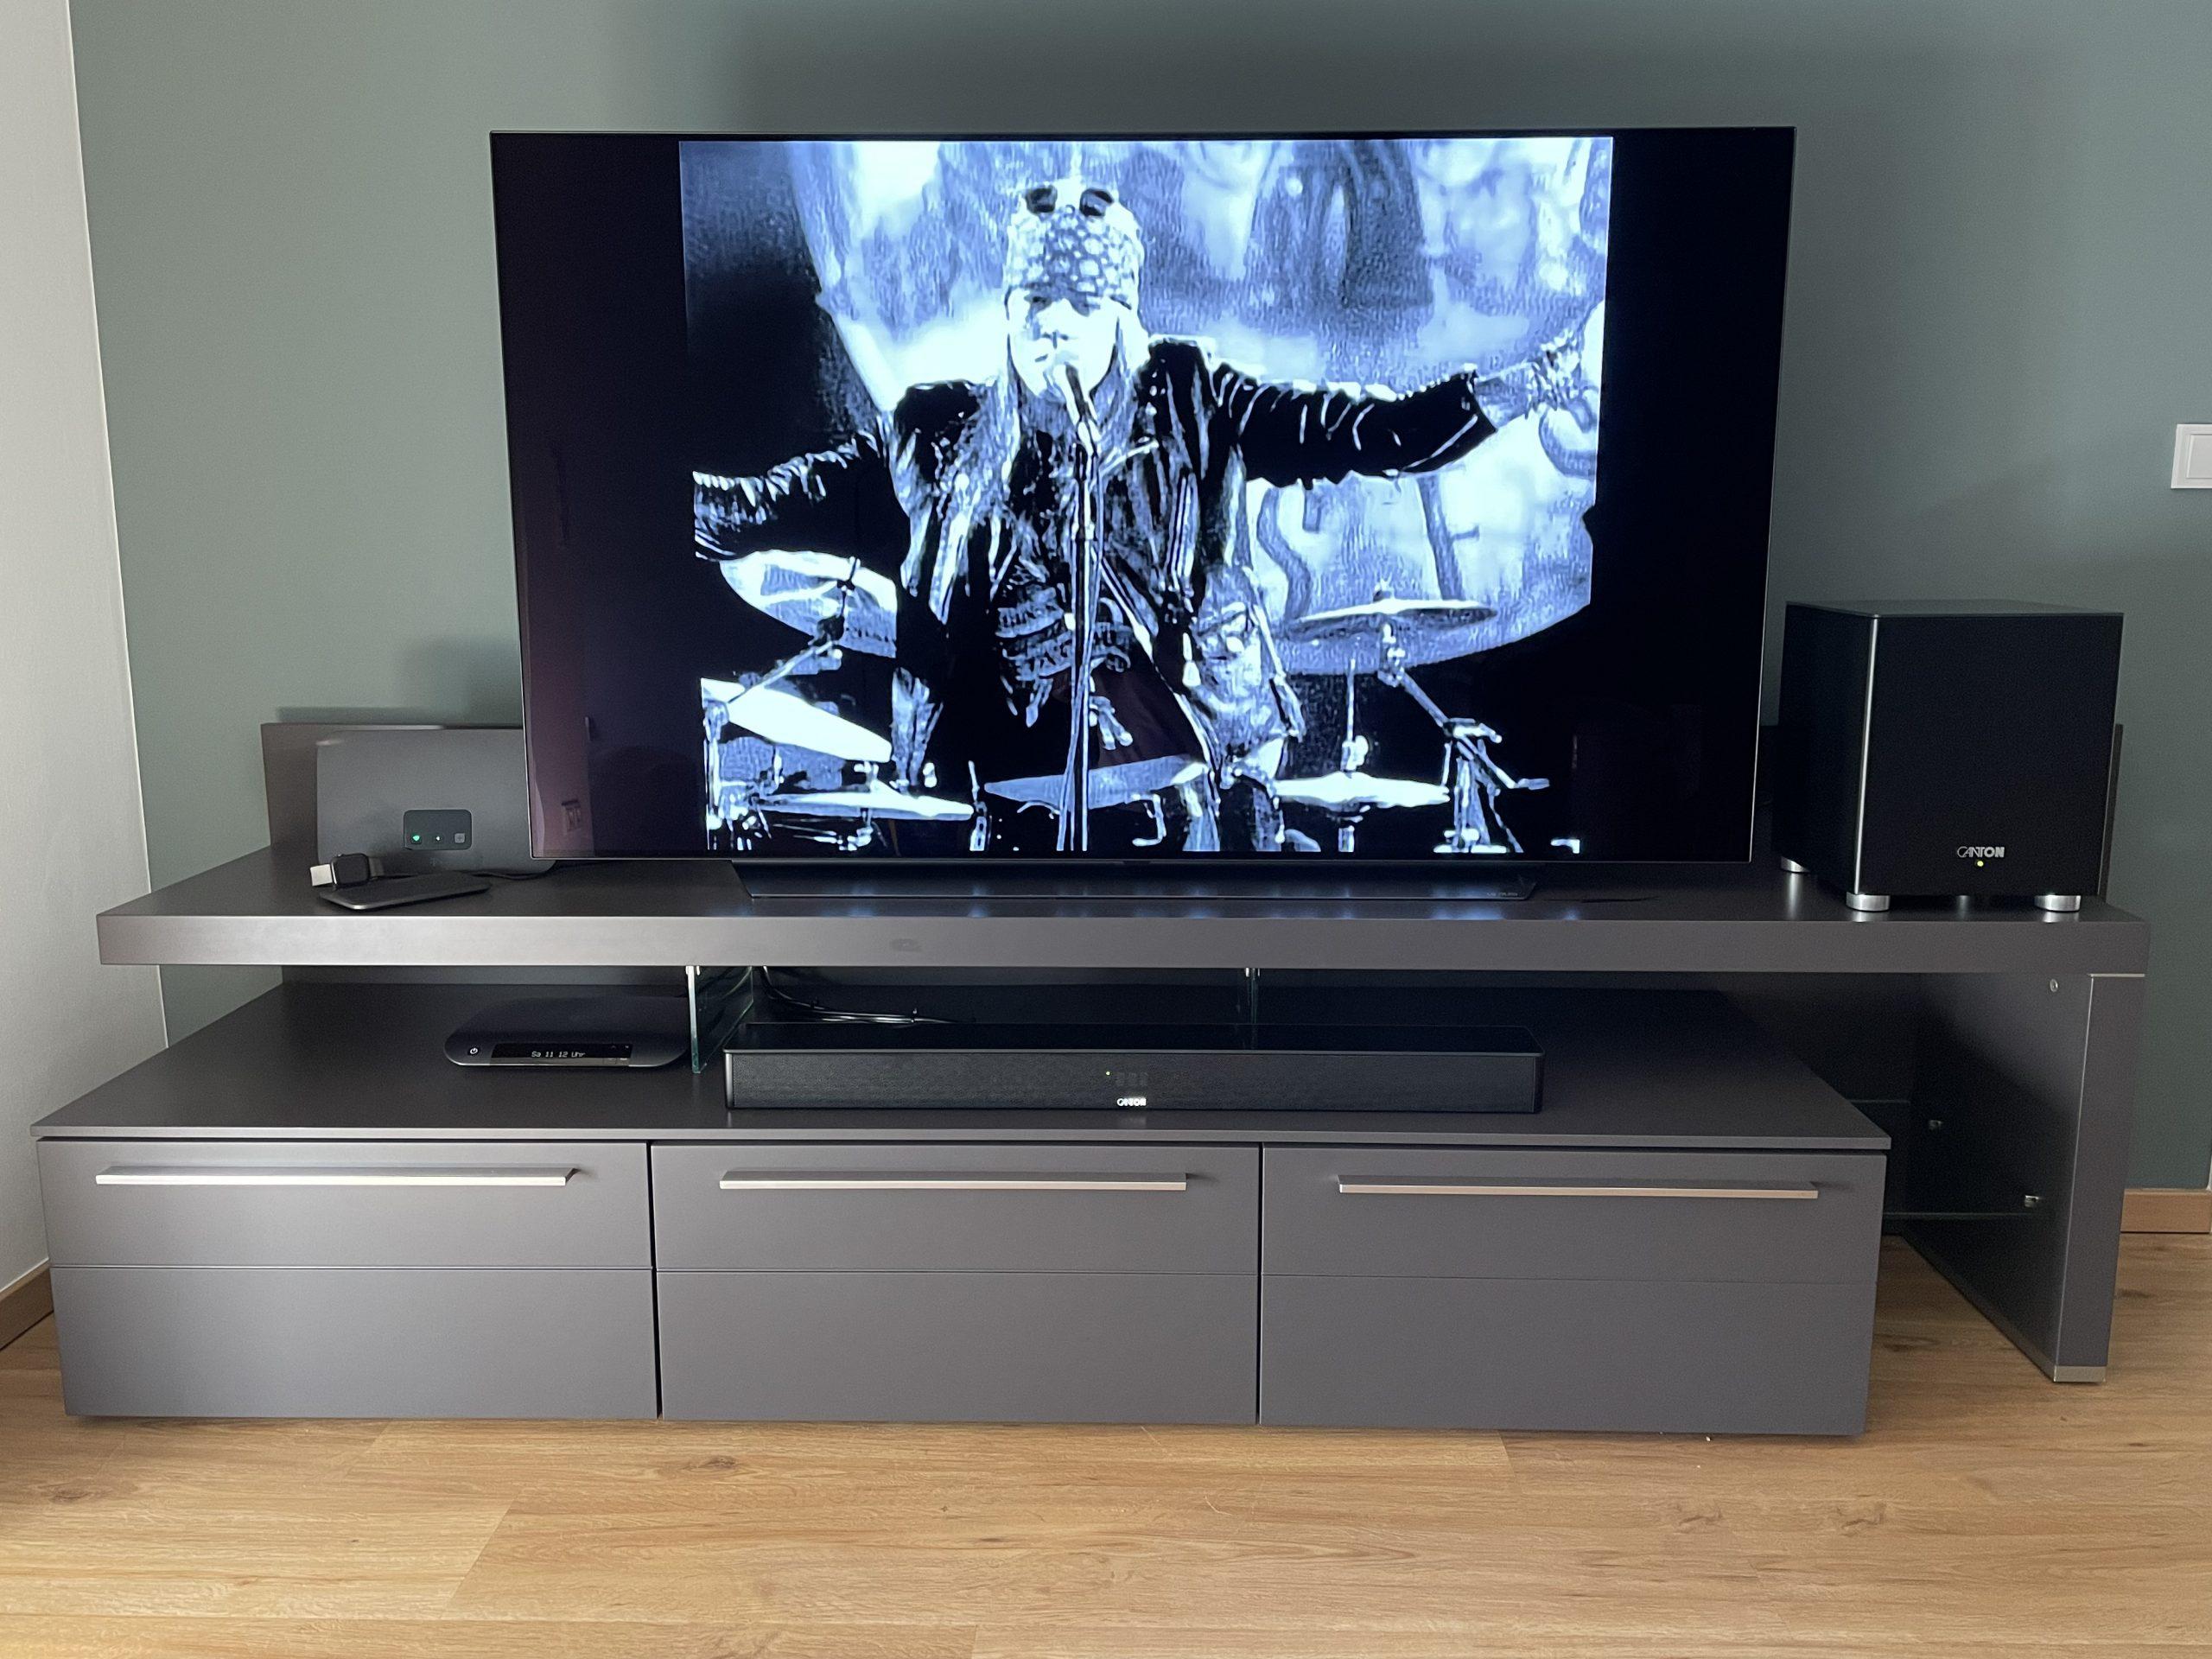 LG OLEDC17 Canton Soundbar 9 Canton Sub